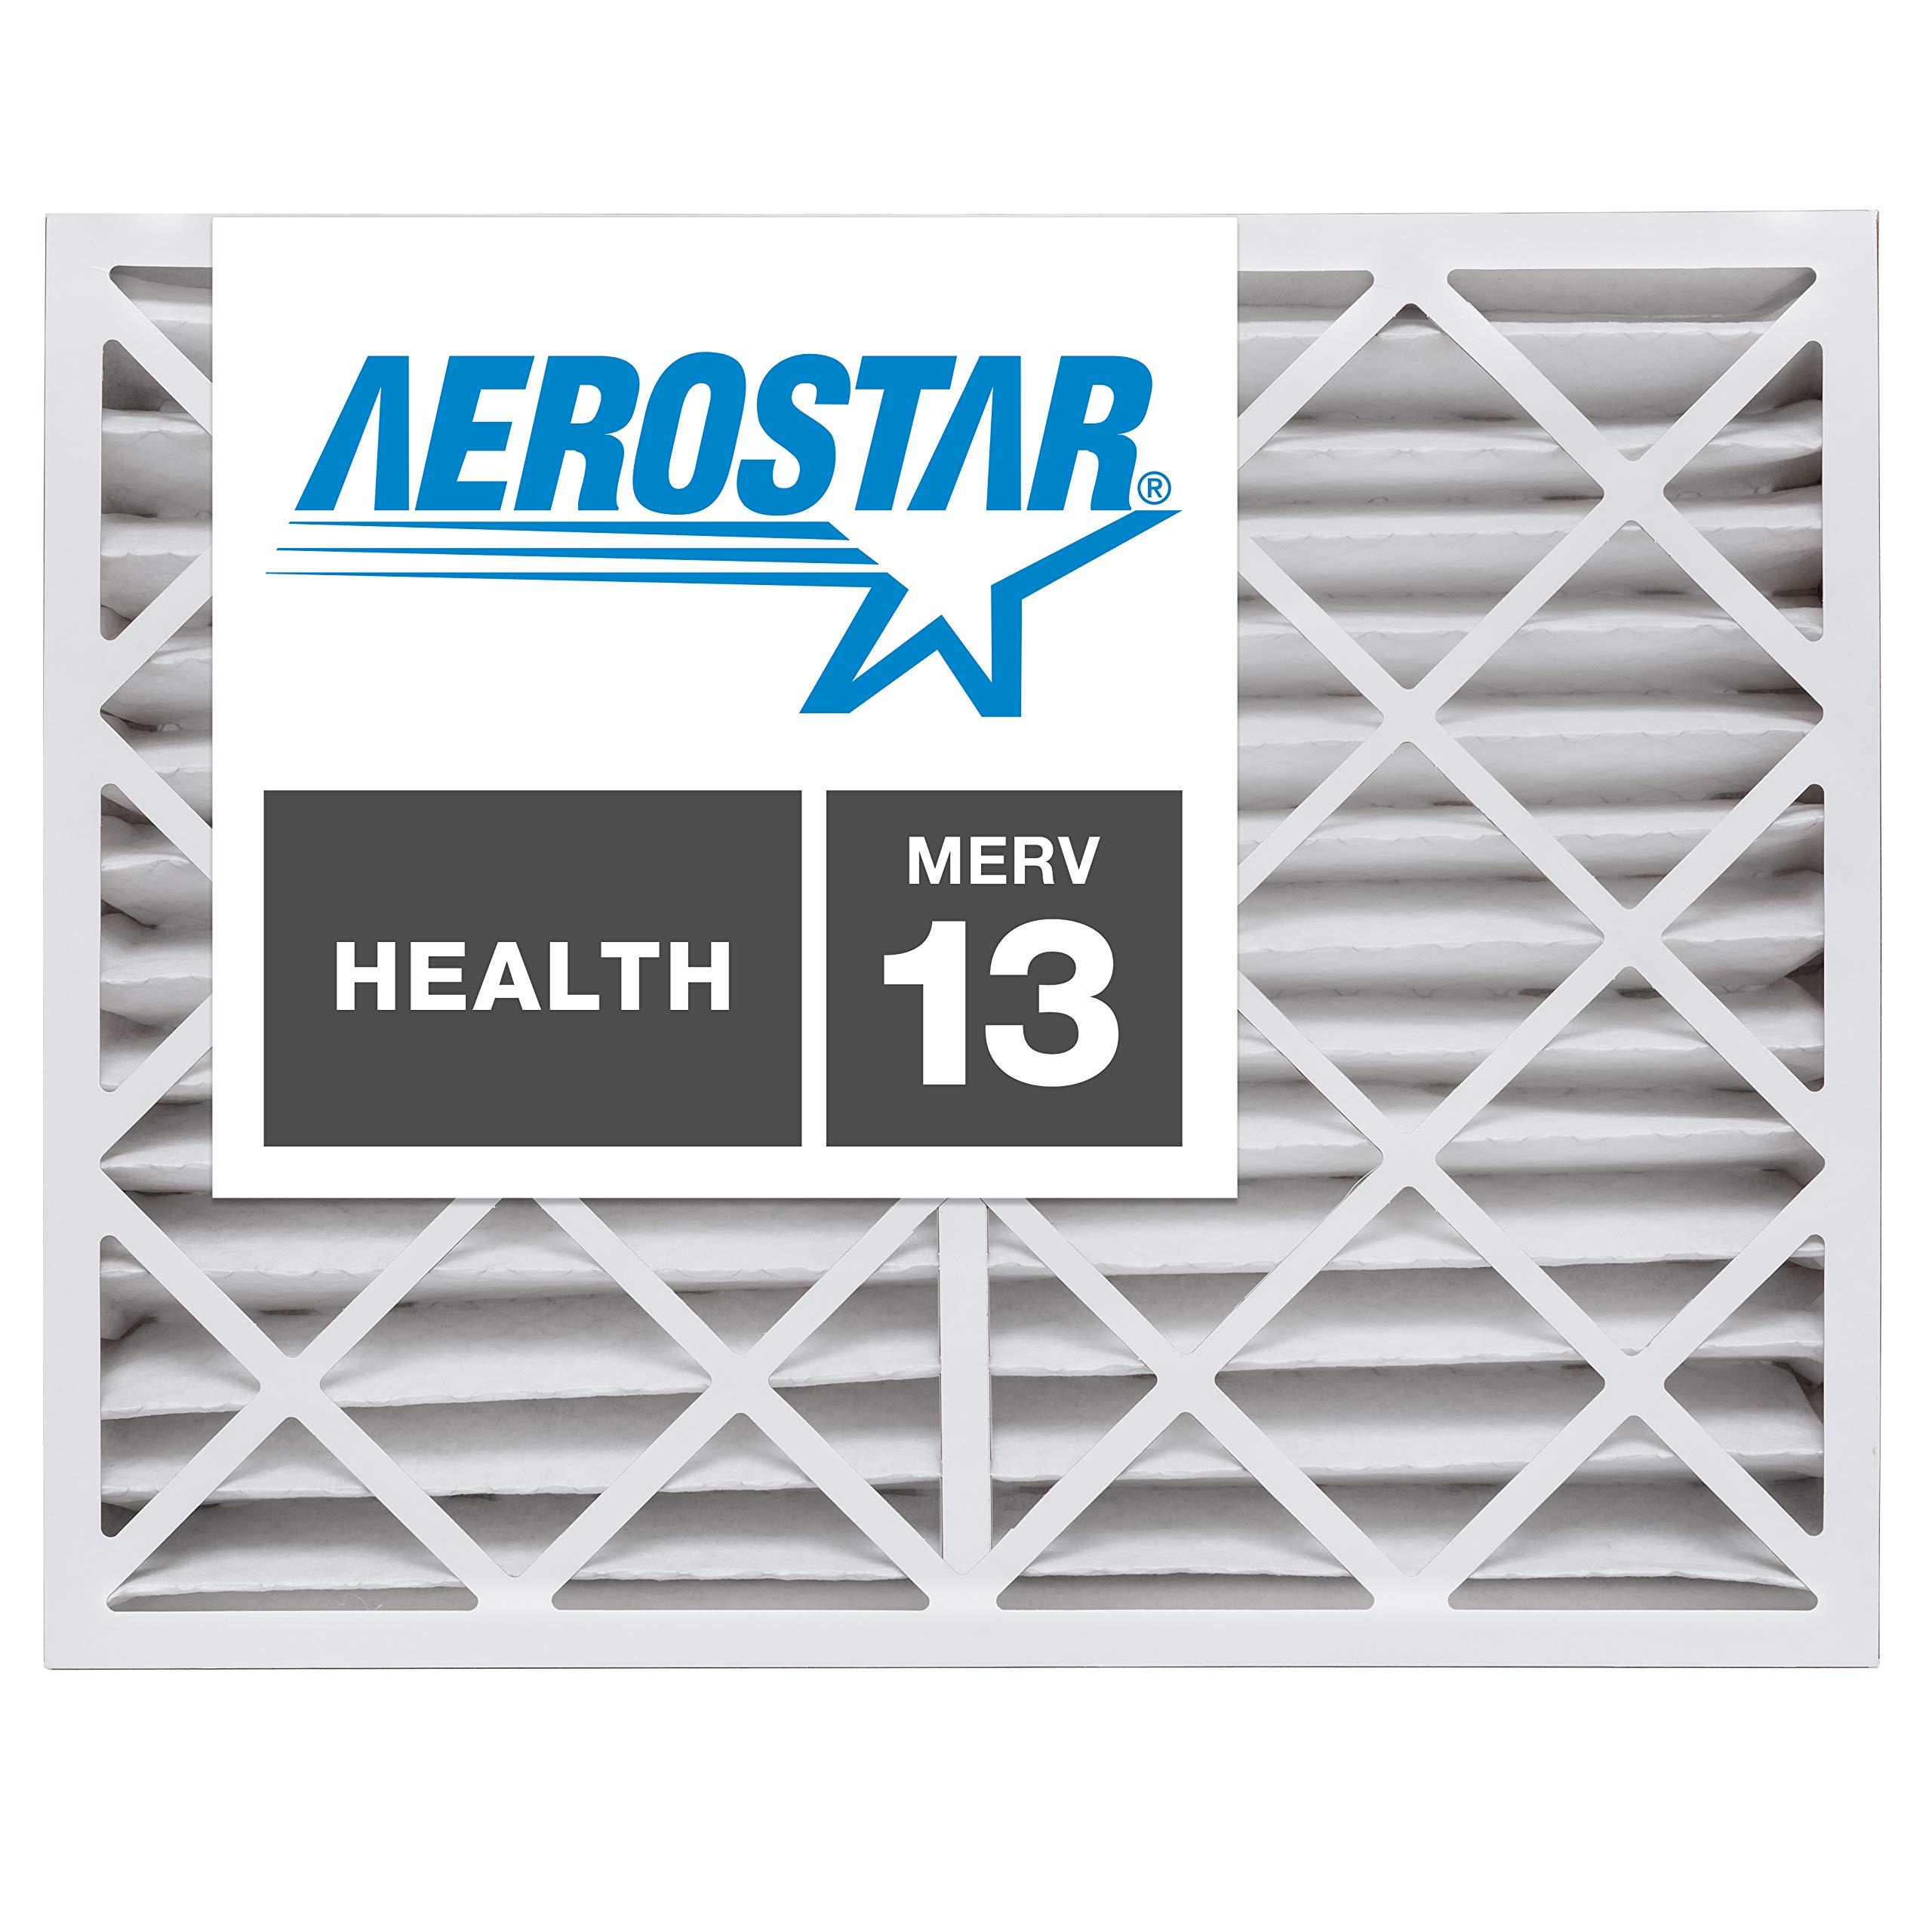 Aerostar 14x20x4 MERV 13, Pleated Air Filter, 14 x 20 x 4, Box of 6, Made in The USA